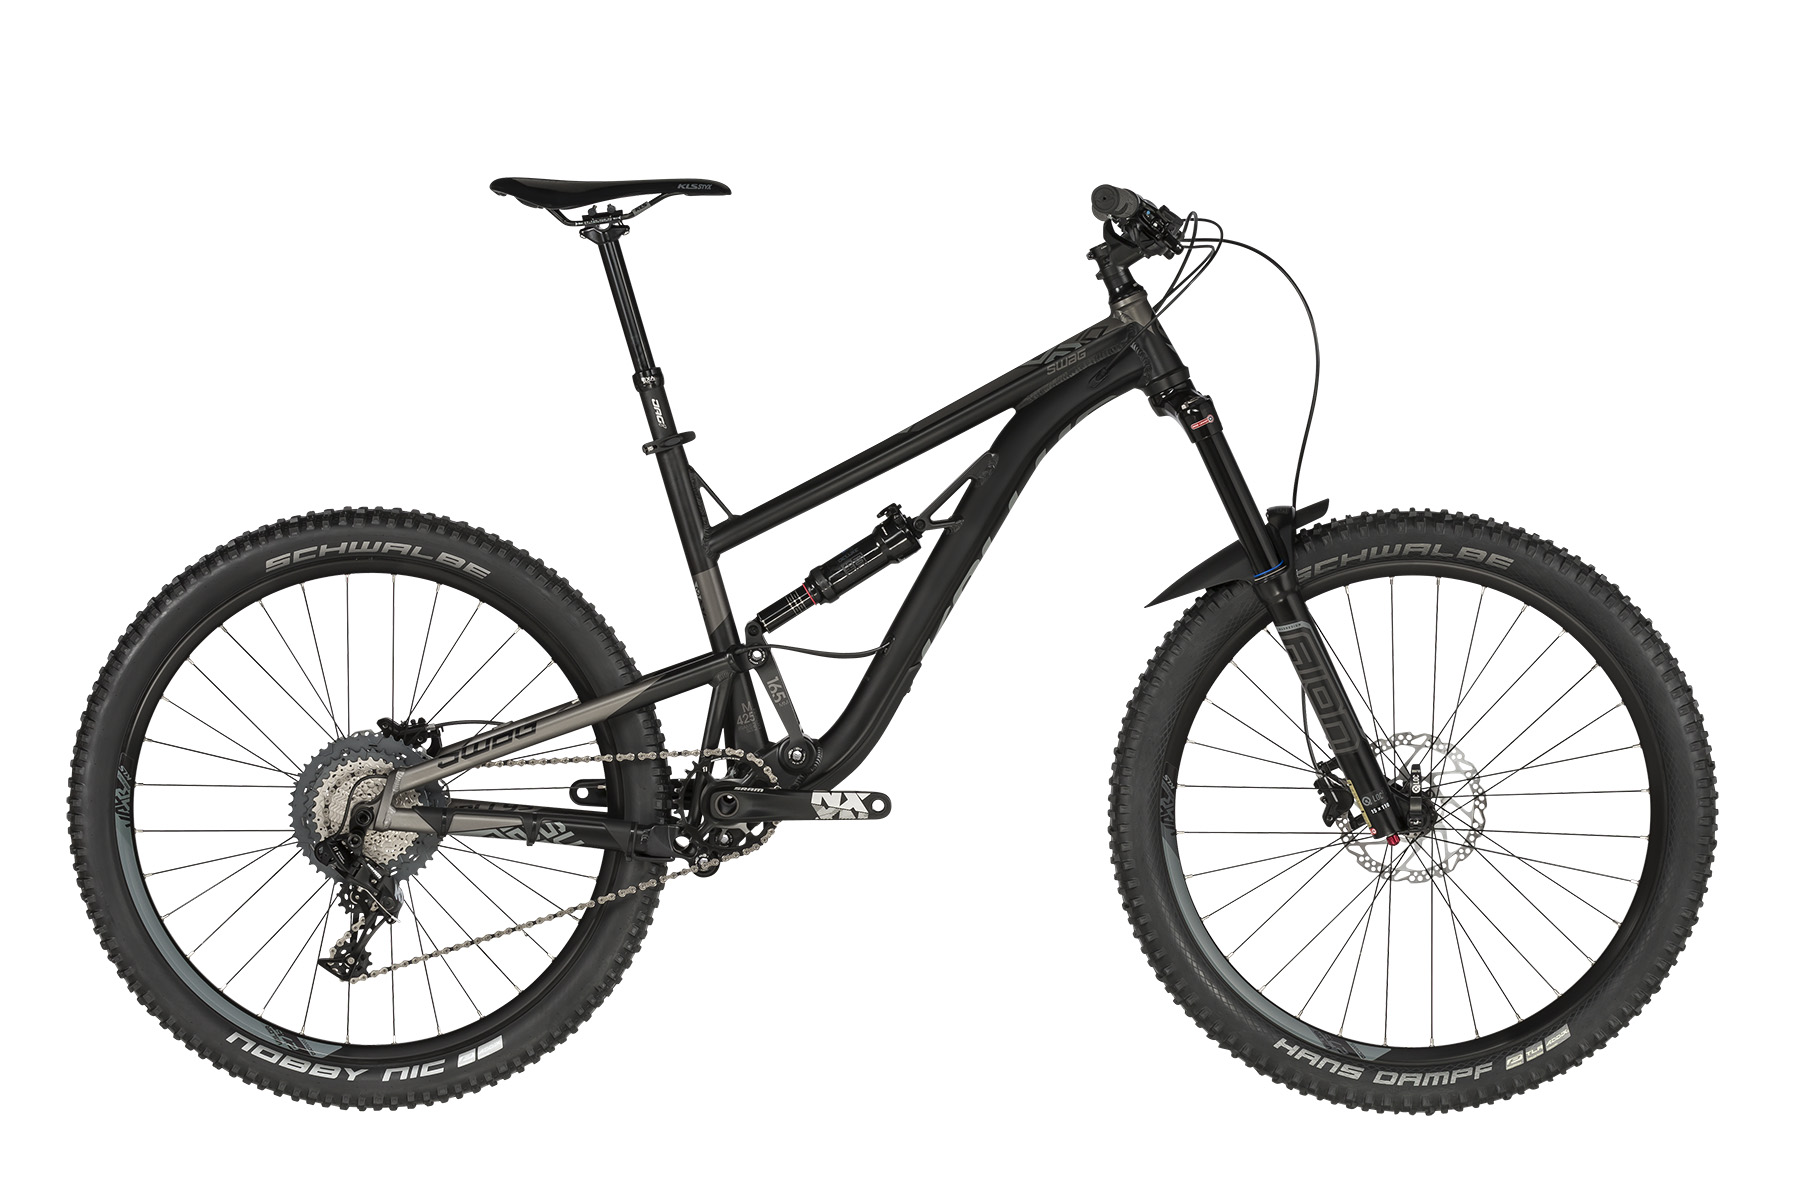 <strong>Bicicleta full suspension, </strong>cu telescop pe fataSR SUNTOUR Aion 35 LOR Boost, 160mm si telescop pe spateROCK SHOX Deluxe RT, DebonAir / Rapid Recovery / Open-Pedal (230x65mm).</p><p><strong>Bicicleta de munte cu echipareSRAM NX,</strong> 11 viteze, o bicicleta recomandata pentru cei ce doresc sa experimenteze senzatii tari.</p><p><strong>frame</strong>KELLYS Enduro 27.5 / Think Link suspension system, 165mm rear travel, tapered HT, internal routing, 12x148mm Boost thru axle<br /><strong>frame size</strong>S / M / L<br /><strong>fork</strong>SR SUNTOUR Aion 35 LOR (27.5) Boost, 160mm, air / Speed Lockout / 15Q-Loc thru axle<br /><strong>rear shock</strong>ROCK SHOX Deluxe RT, DebonAir / Rapid Recovery / Open-Pedal (230x65mm)<br /><strong>head parts</strong>FSA 1.5 integrated<br /><strong>b.b.parts</strong>SRAM PressFit GXP<br /><strong>crankset</strong>SRAM NX 1x X-Sync (30) - length 175mm<br /><strong>shifters</strong>SRAM NX 11-Speed X-Actuation Trigger<br /><strong>r/derailleur</strong>SRAM NX 1x11 X-Horizon<br /><strong>speed</strong>11<br /><strong>cassette sprocket</strong>SHIMANO CS-M7000-11 (11-46)<br /><strong>chain</strong>KMC X11 (110 links)<br /><strong>brakes</strong>SHIMANO MT400 Hydraulic Disc<br /><strong>brake rotors</strong>180mm front / 180mm rear<br /><strong>brake levers</strong>SHIMANO BL-MT400<br /><strong>hubs</strong>SHIMANO MT400-B Disc Center Lock (15x110mm / 12x148mm / 32 holes)<br /><strong>thru axle</strong>SR SUNTOUR Q-Loc 15x110mm front / Mr.CONTROL 12x148mm rear<br /><strong>rims</strong>KLS Valor 2 Disc 584x27 (32 holes)<br /><strong>spokes</strong>stainless steel black<br /><strong>tires</strong>SCHWALBE Hans Dampf Performance 60-584 (27.5x2.35) Tubeless Ready, ADDIX, folding front / SCHWALBE Nobby Nic Performance 60-584 (27.5x2.35) ADDIX, folding rear<br /><strong>stem</strong>KLS Alm/En 50 - diam 28.6mm / bar bore 31.8mm / length 45mm (S - M), 60mm (L)<br /><strong>handlebar</strong>KLS Alm/En 70 RiseBar - diam 31.8